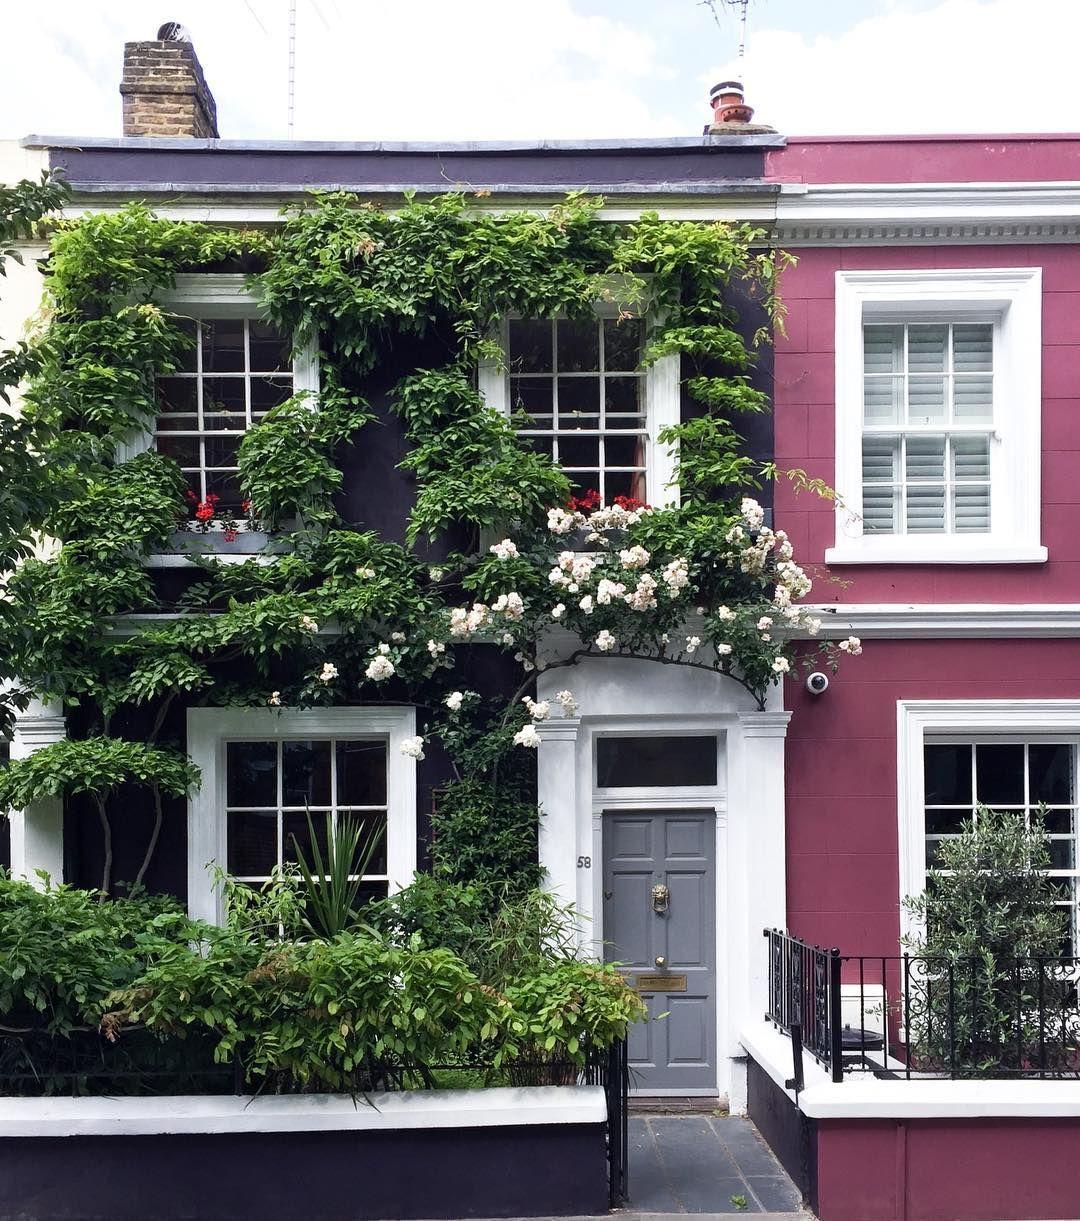 London Apartments Exterior: Nottinghill - Lara In London (@larainlondon)